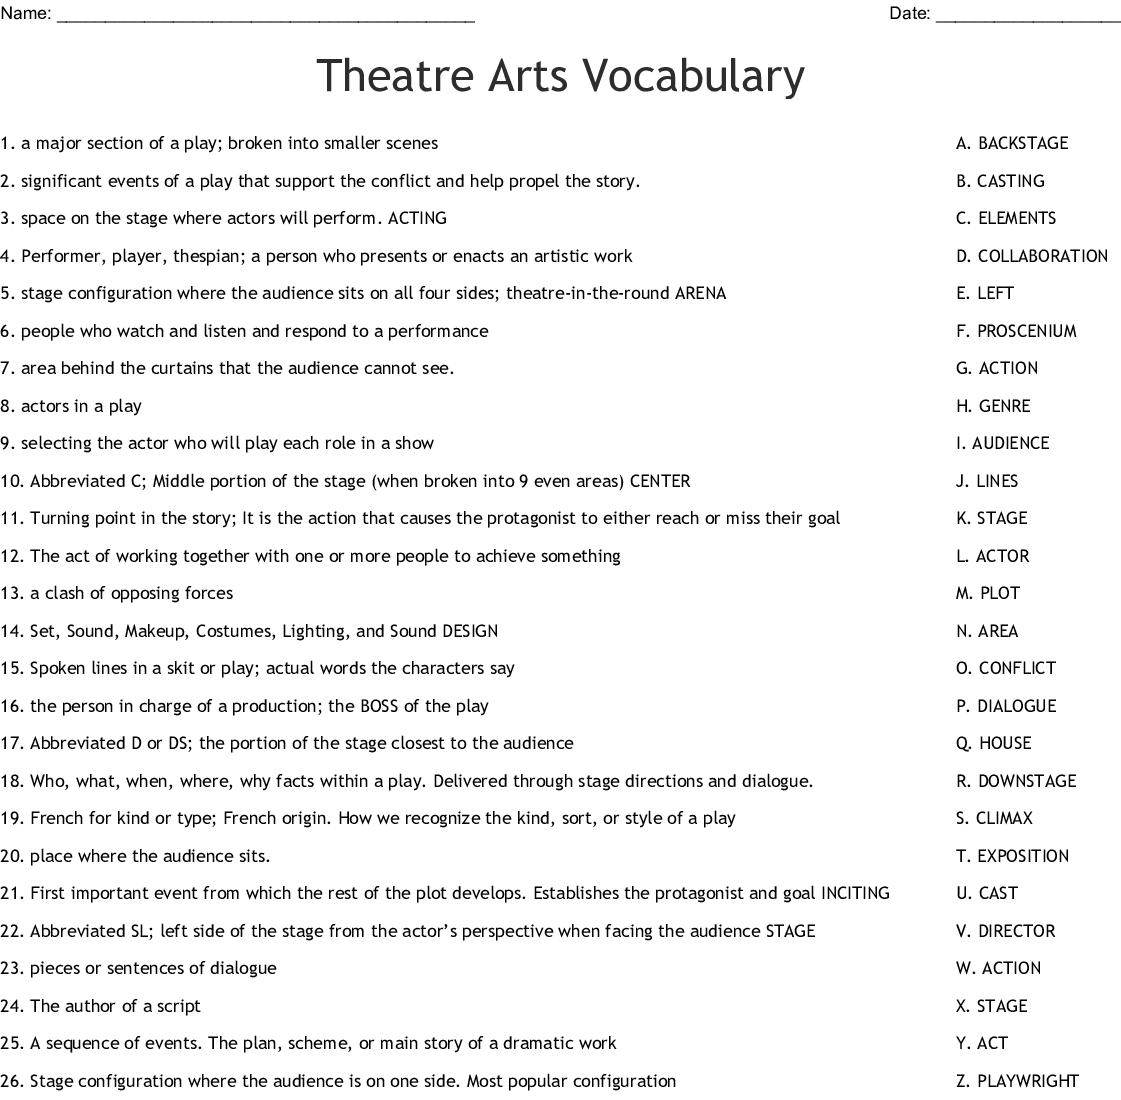 Theatre Arts Vocabulary Worksheet